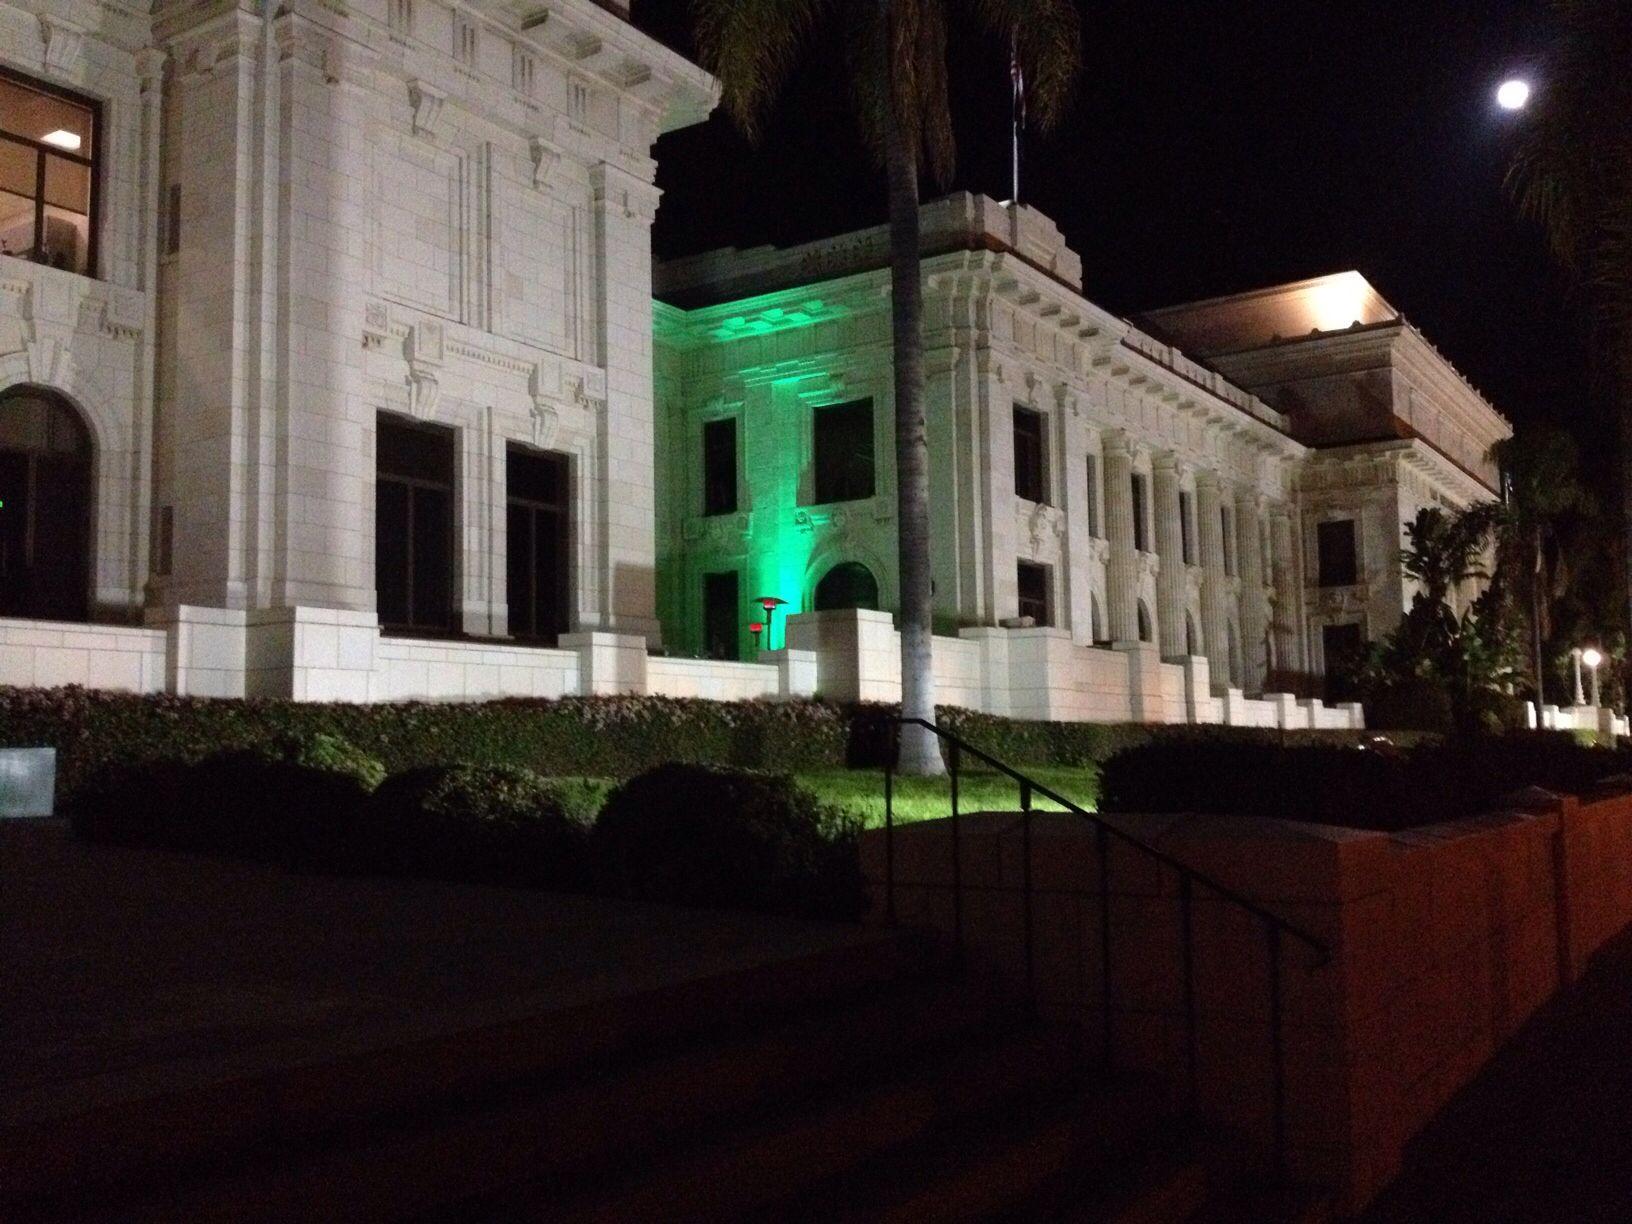 Free Wedding Venue Ideas.Beautiful Wedding Venue Ideas Ventura City Hall Here S A